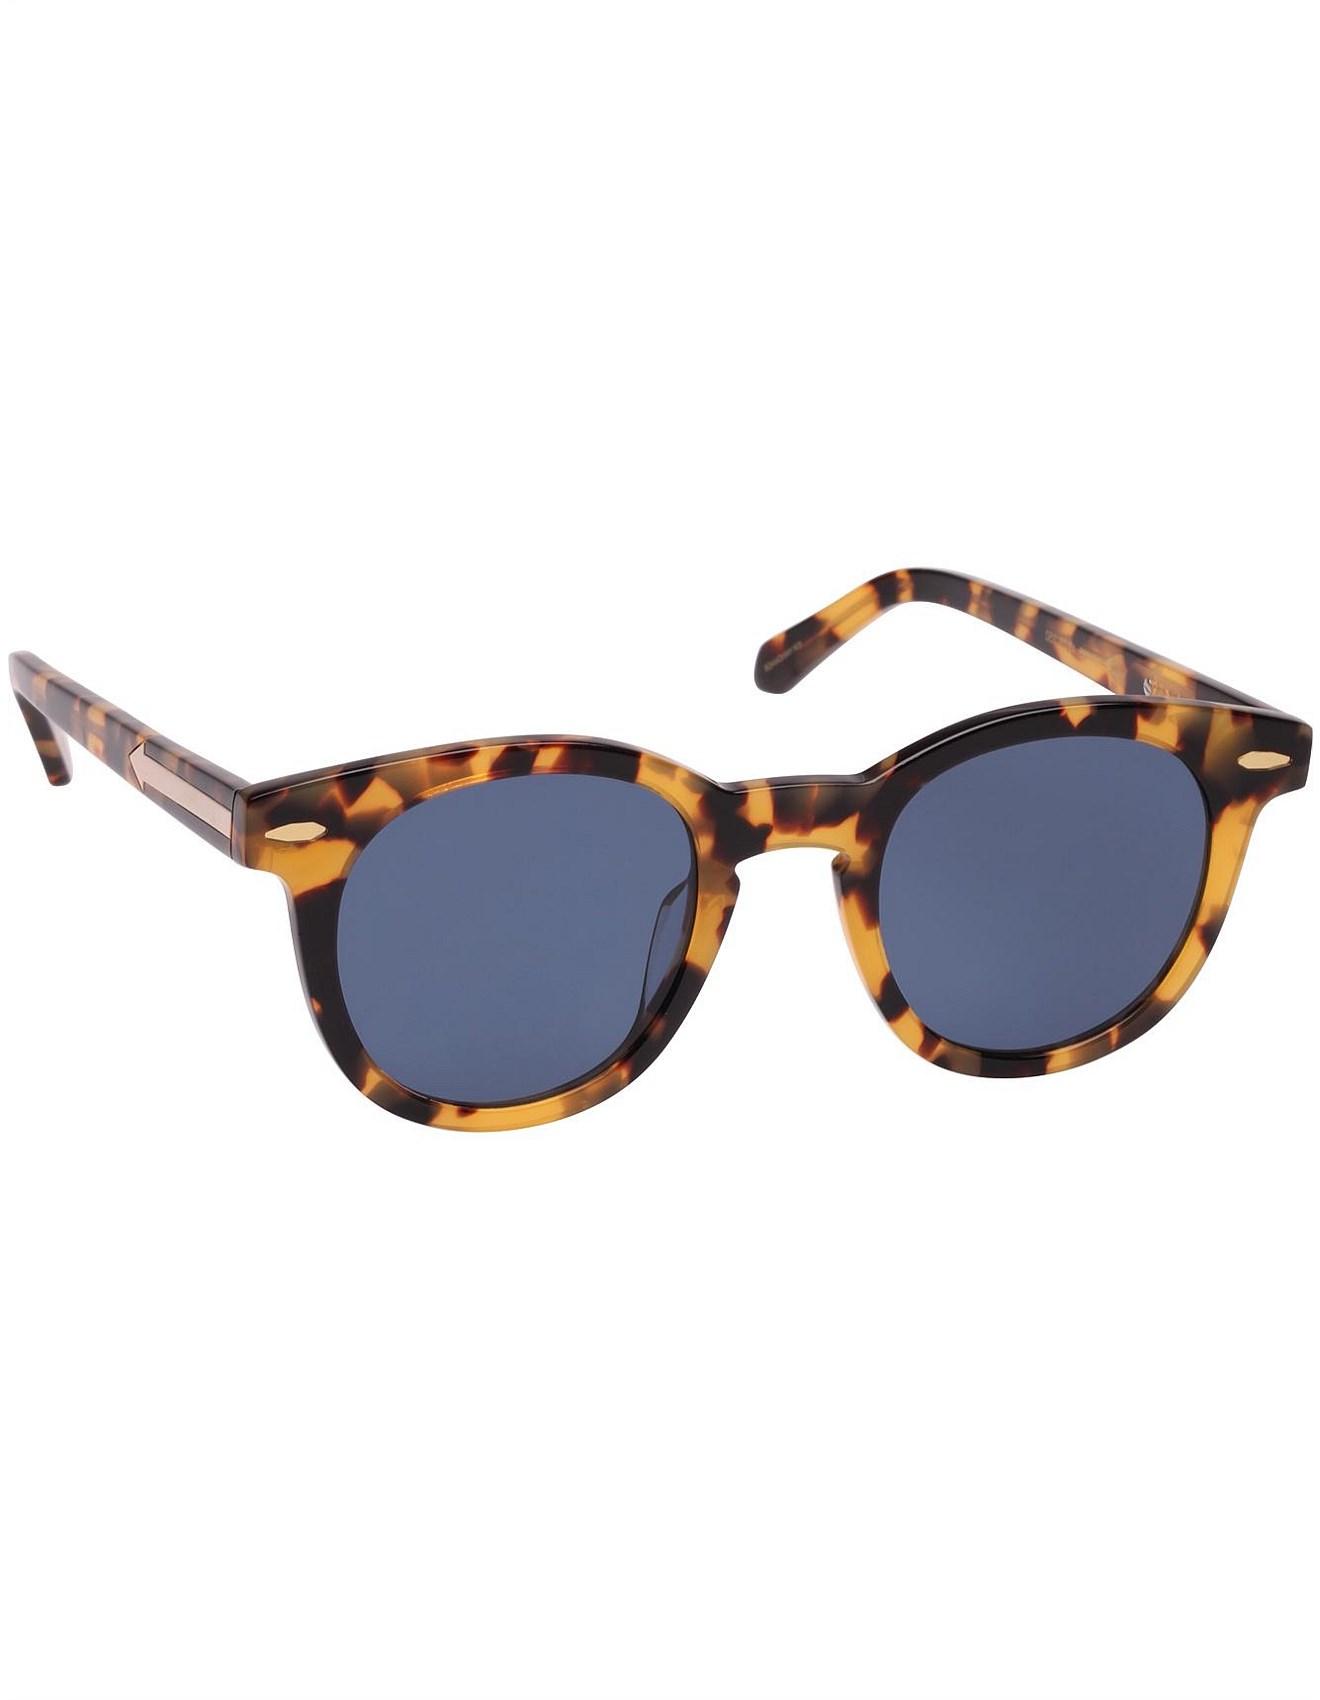 4d8b0cc81c8 Wilde Sunglasses